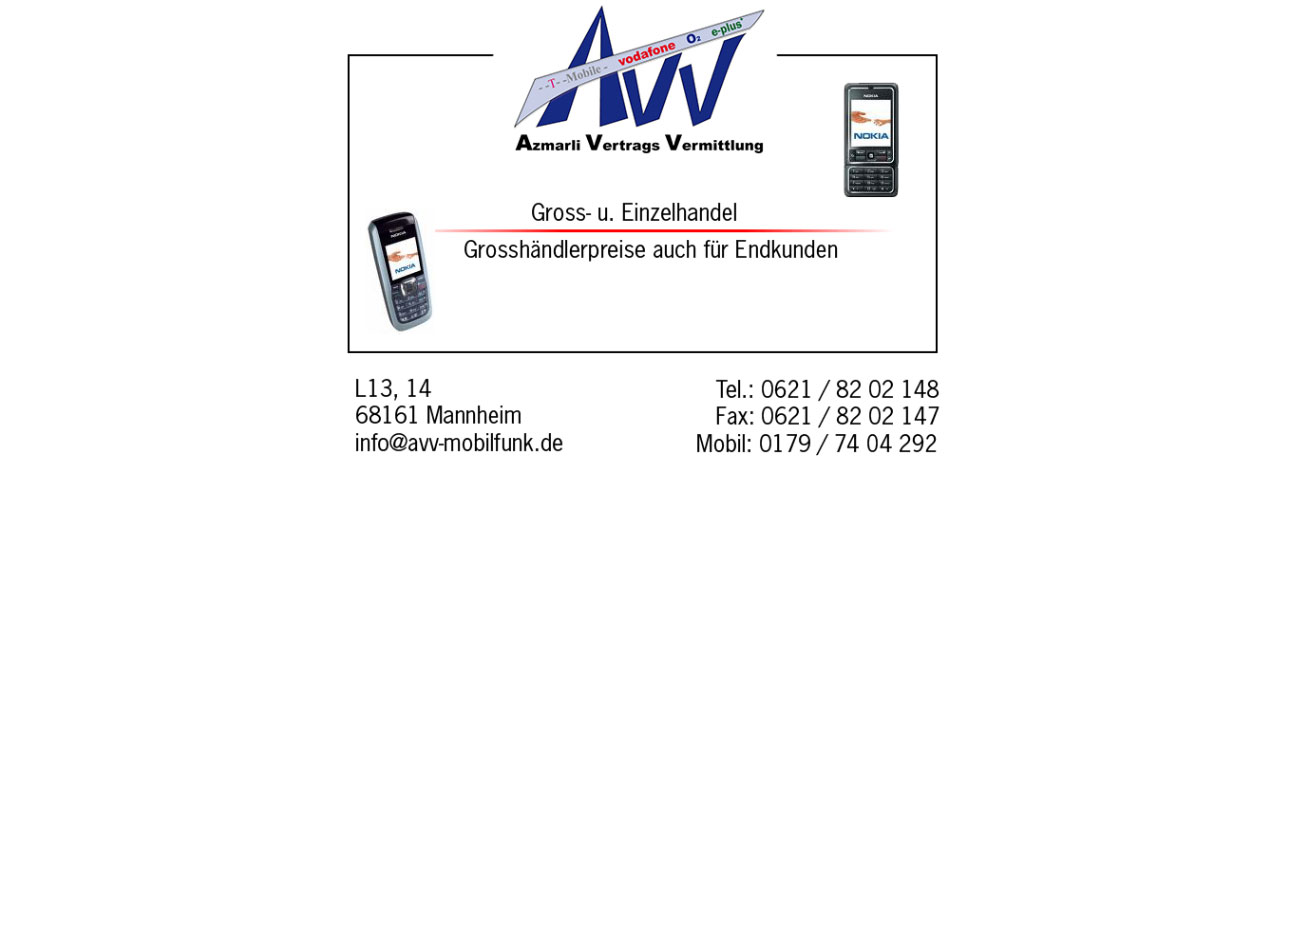 AVV Mobilfunk